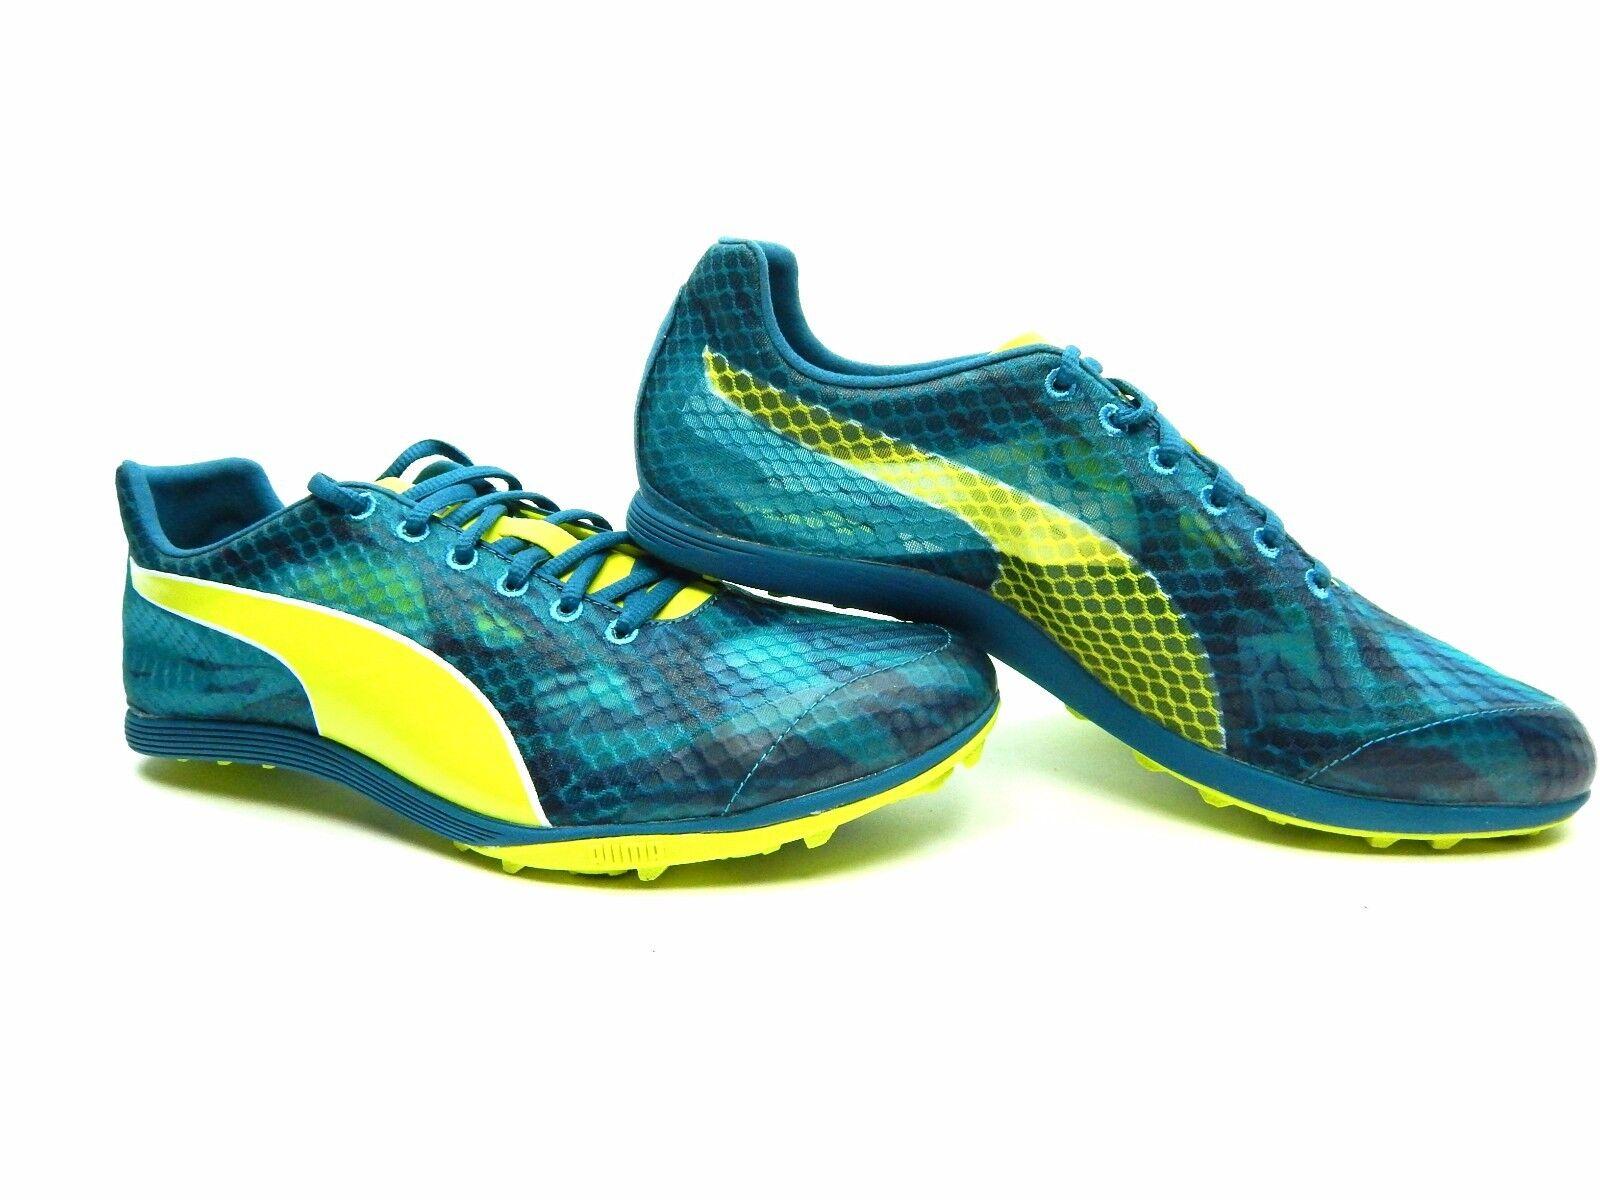 PUMA CROSSFOX XCS V2 SIZE Blau CORAL SULPHUR WOMEN Schuhe SIZE V2 11 04ac83